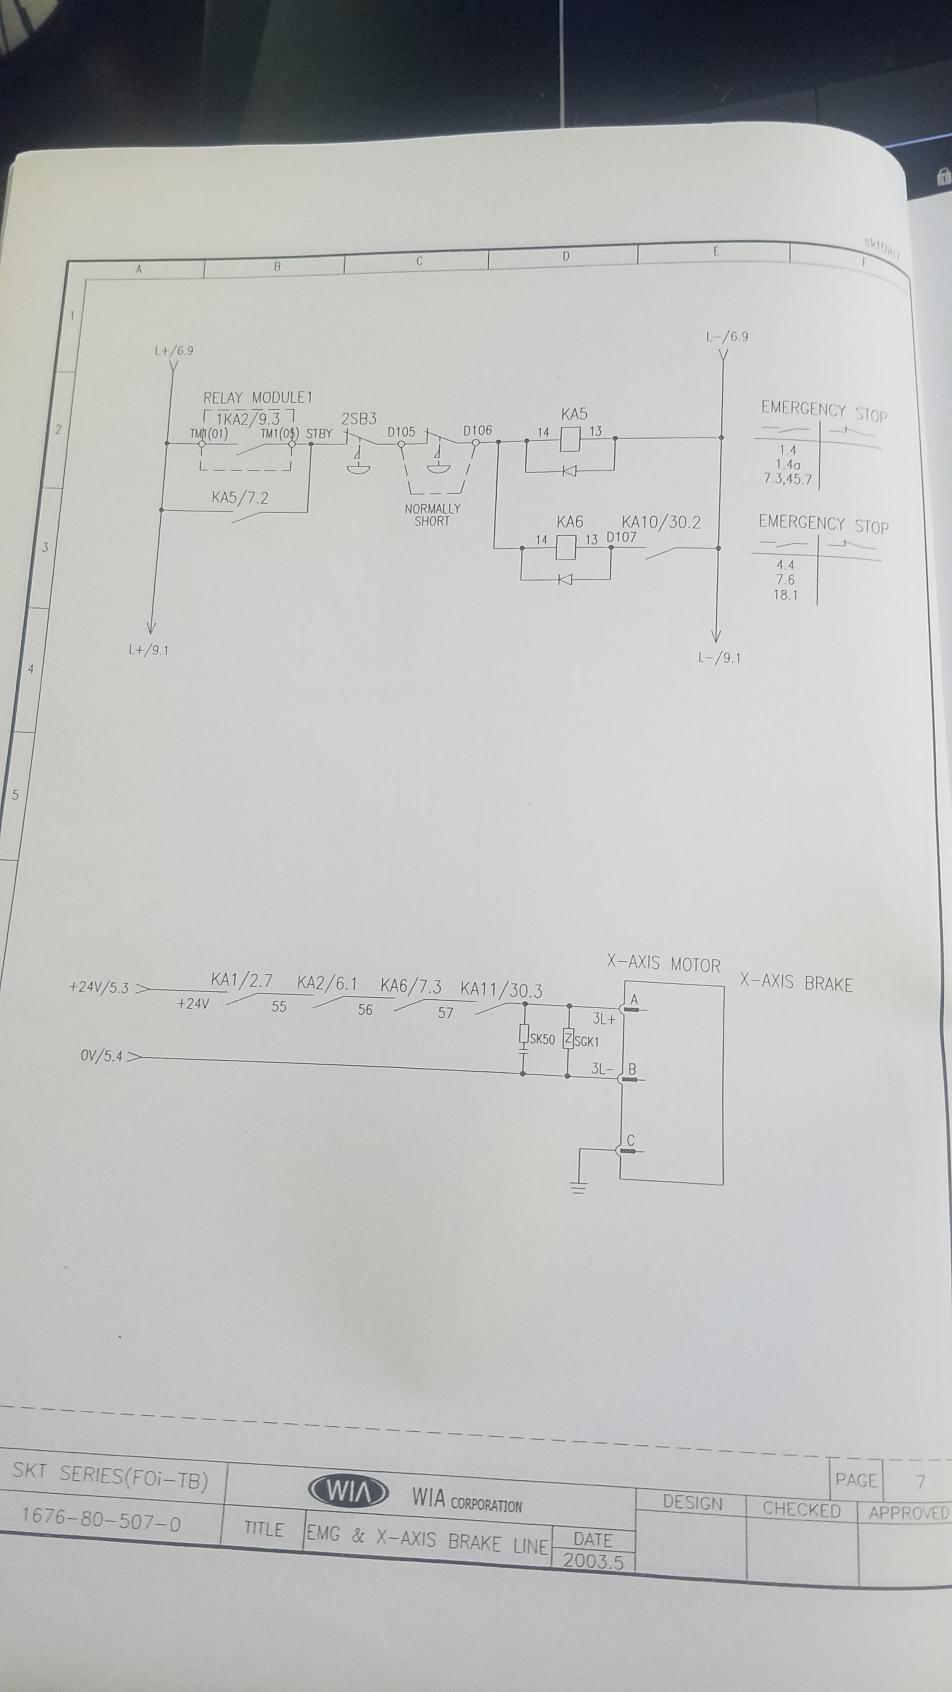 FANUC 0i-TB on KIA SKT21LMS- 410 Servo Alarm B Axis Excess Error